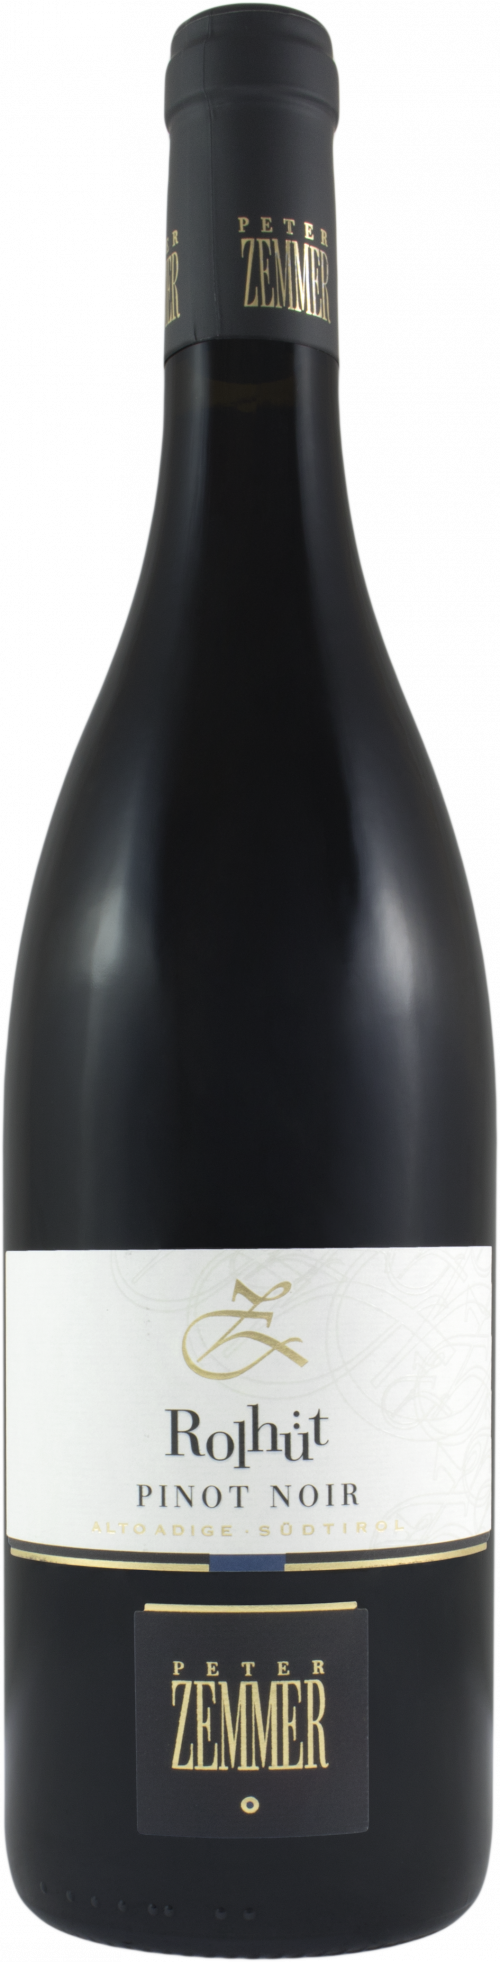 2018 Peter Zemmer Pinot Nero Rollhut 750Ml